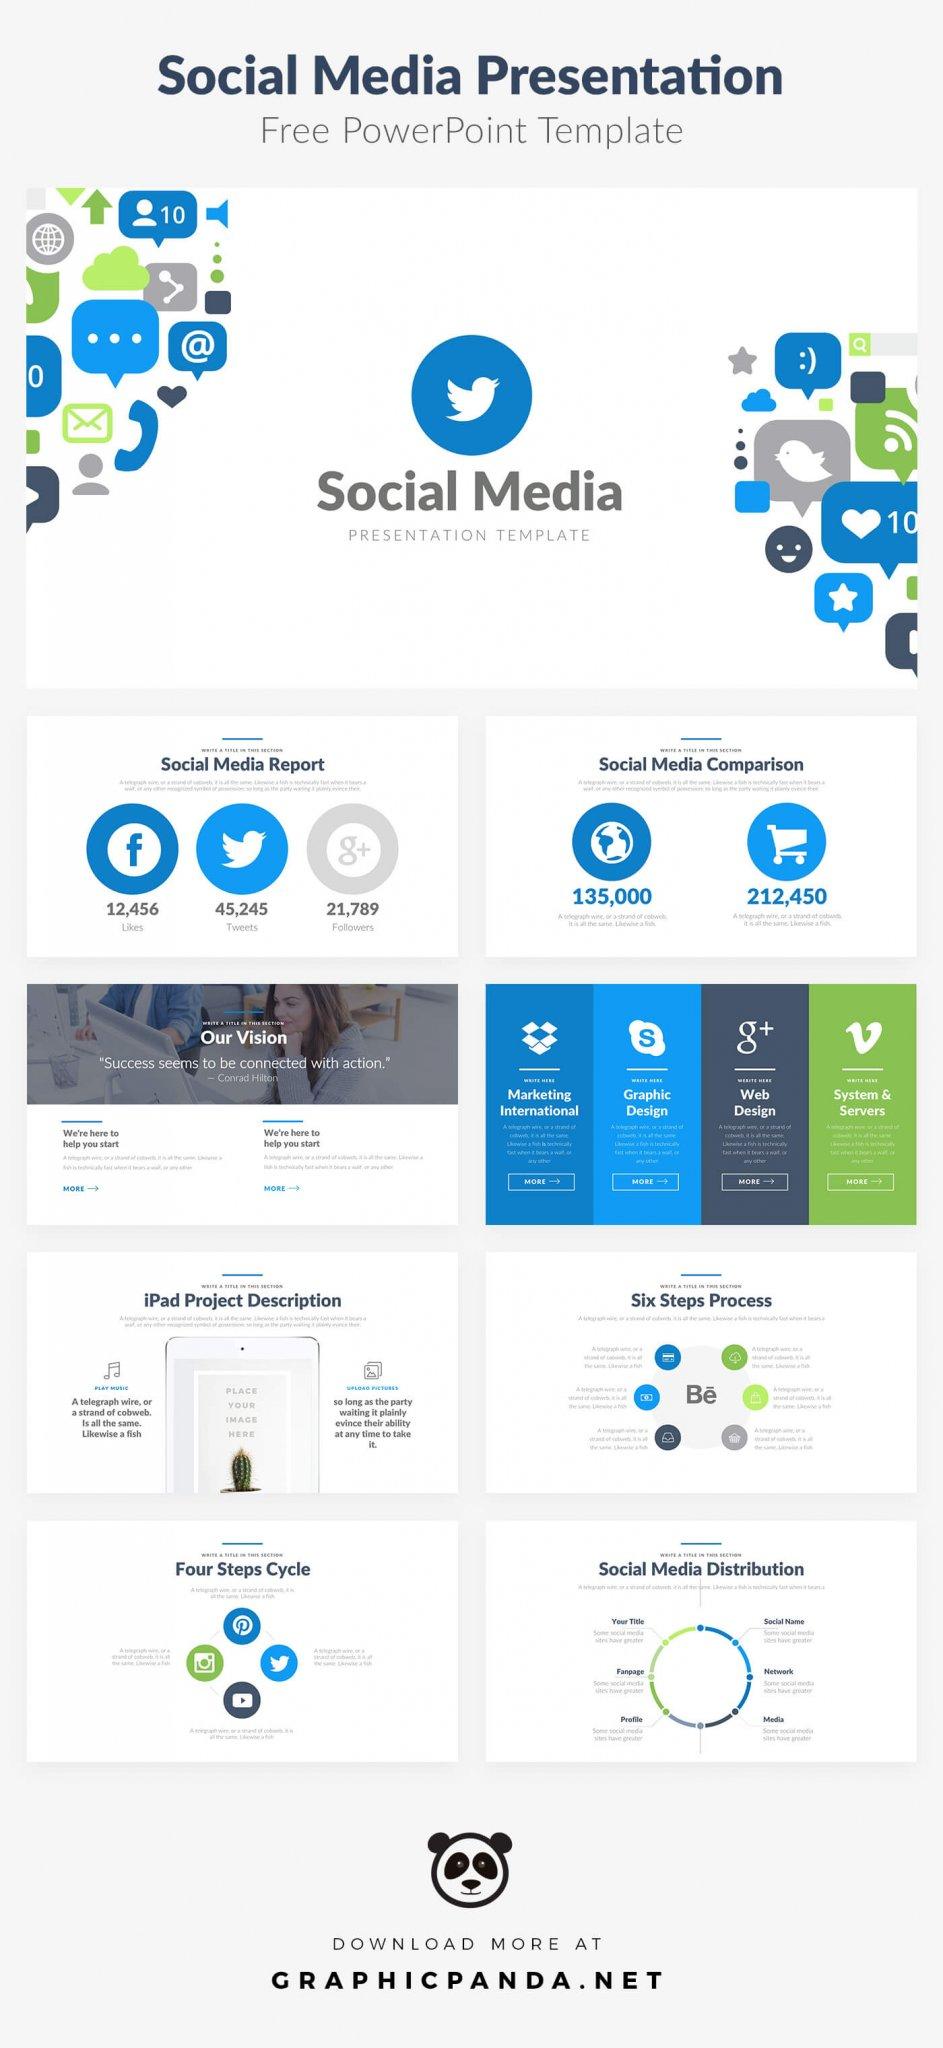 Free Social Media Powerpoint Templates